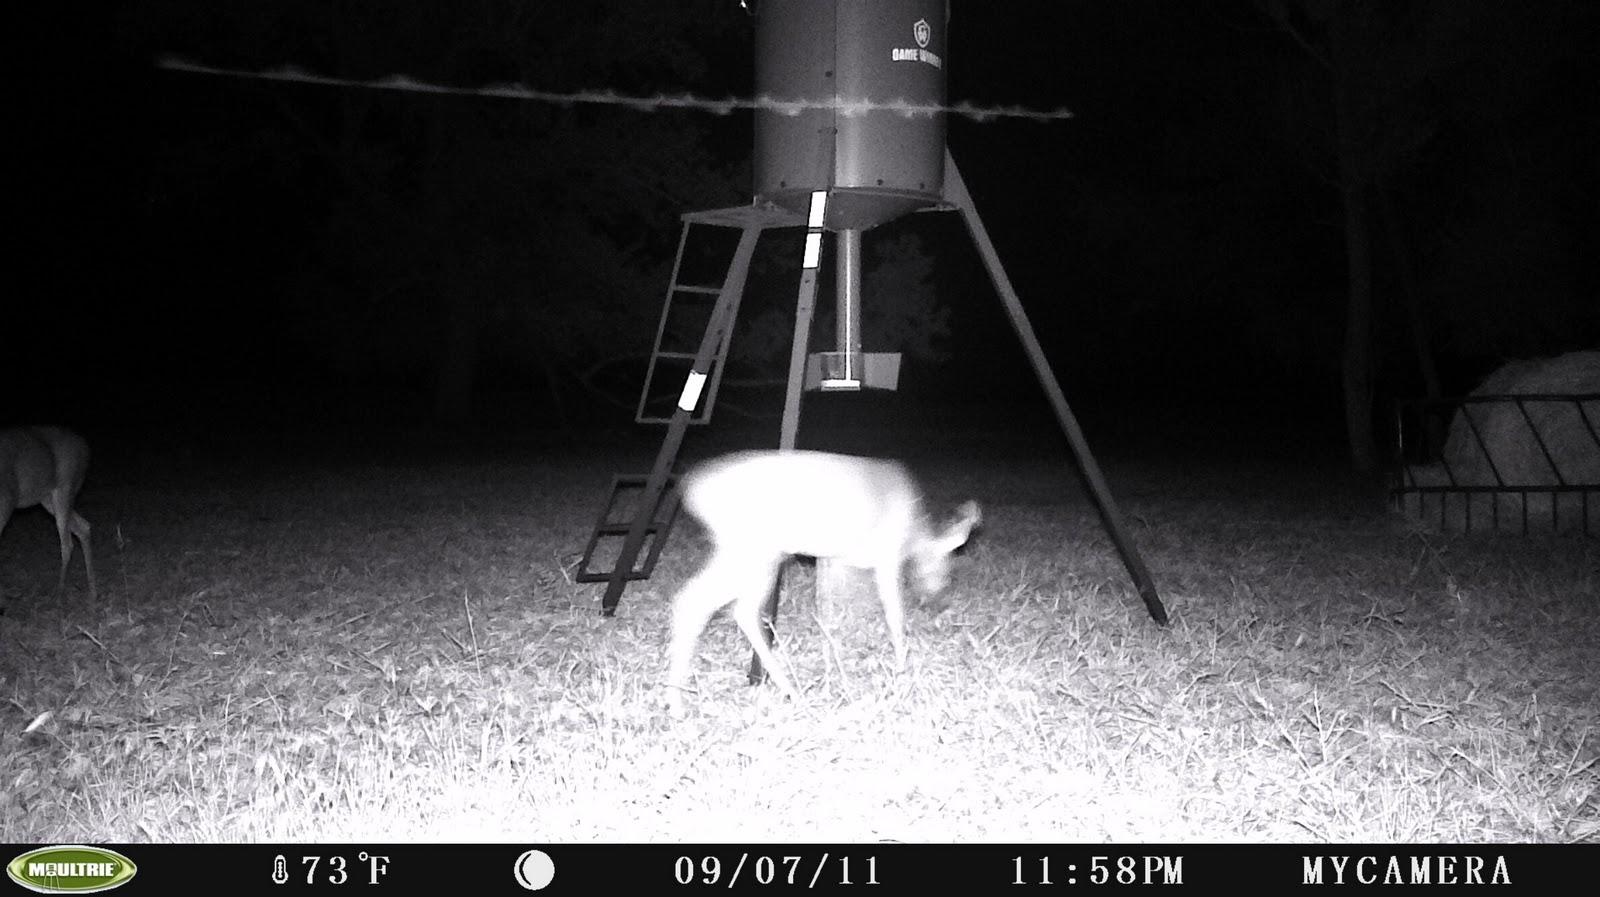 Wild Game Camera Catches Alien Rod In Night Photo, Oct 10, 2011 UFO ...